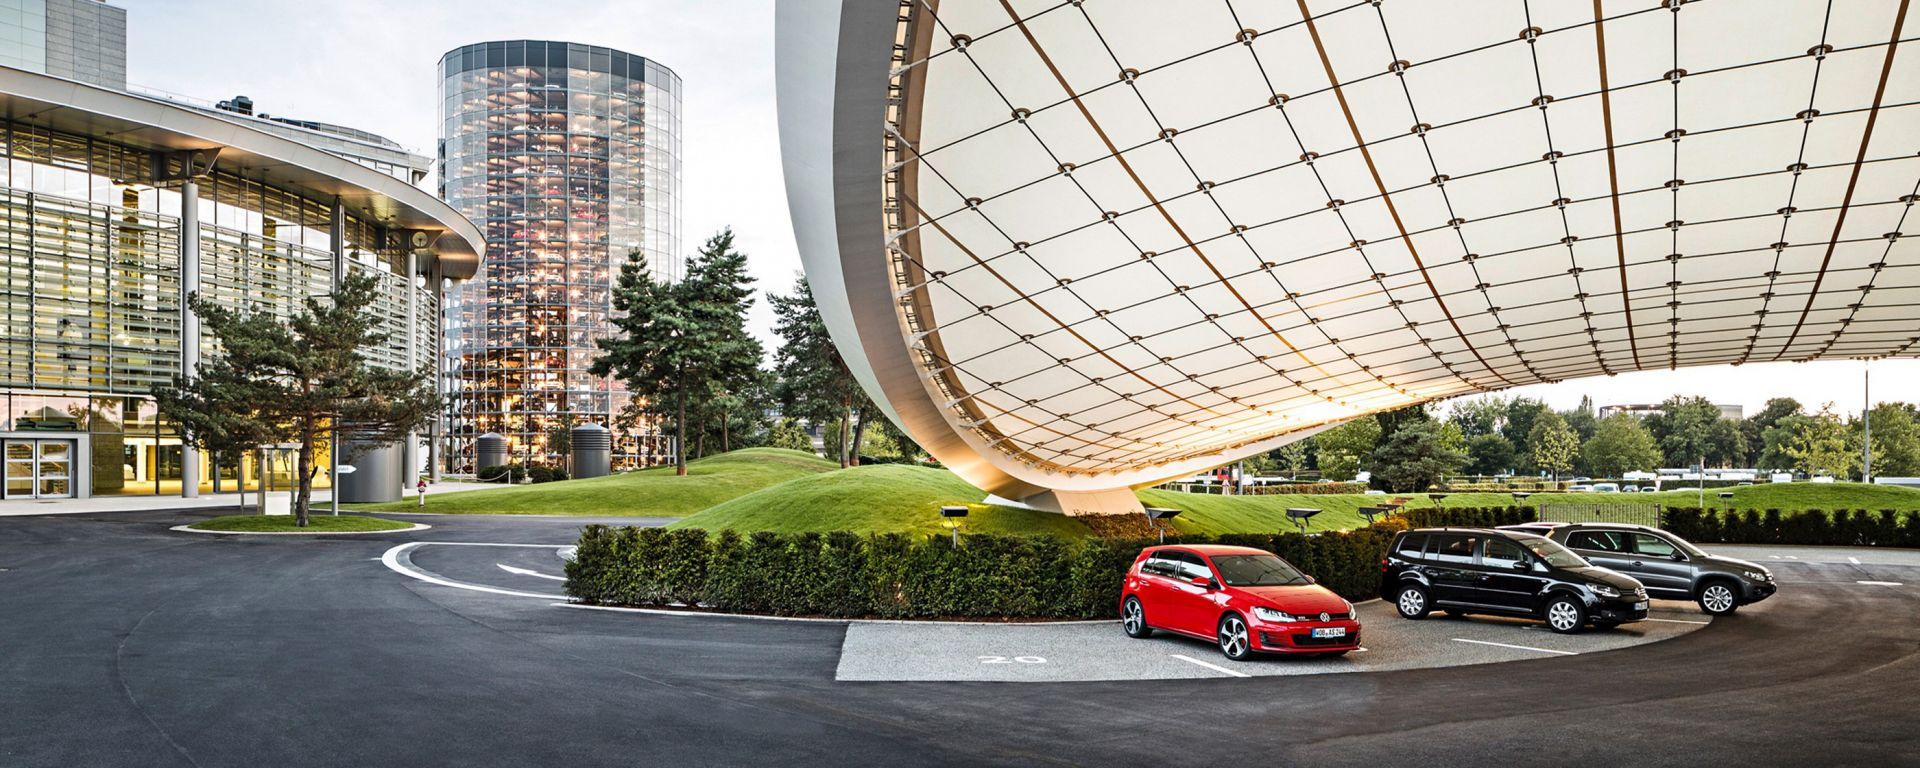 Autostadt: record di visitatori nel 2015